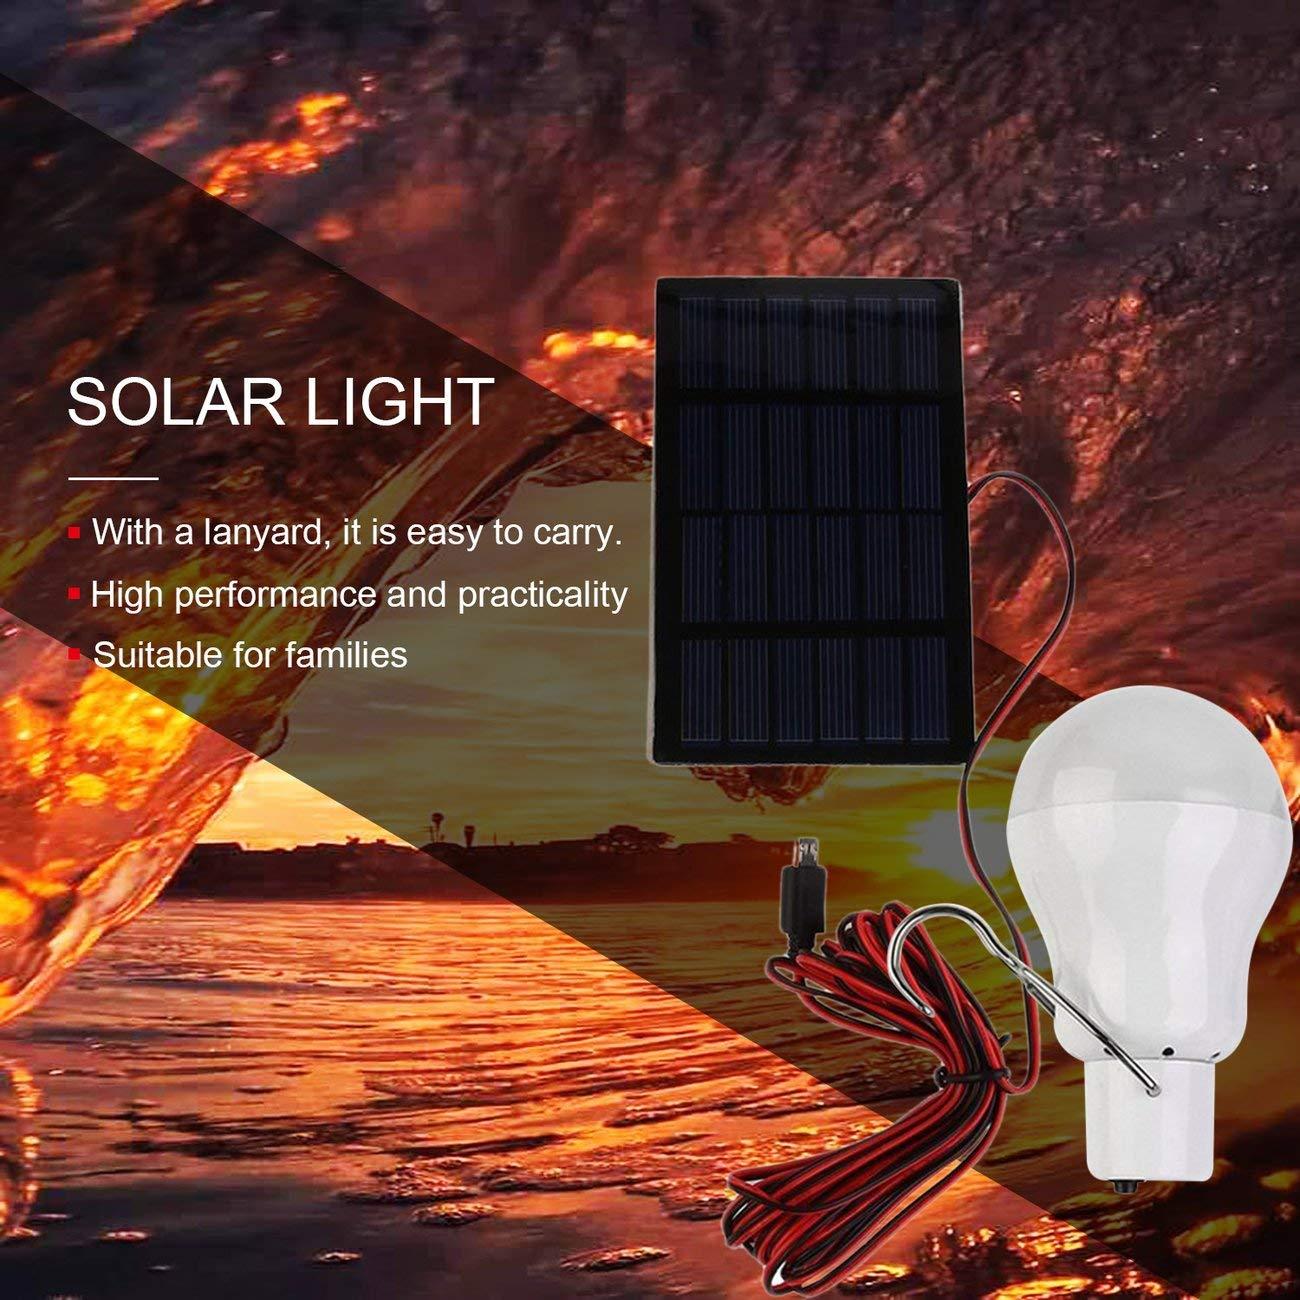 15W 150 Lampada portatile a energia solare Lampadina a LED a energia solare Lampada a energia solare caricata Torcia da esterno Tenda da campeggio Luce da pesca bianca JBP-X